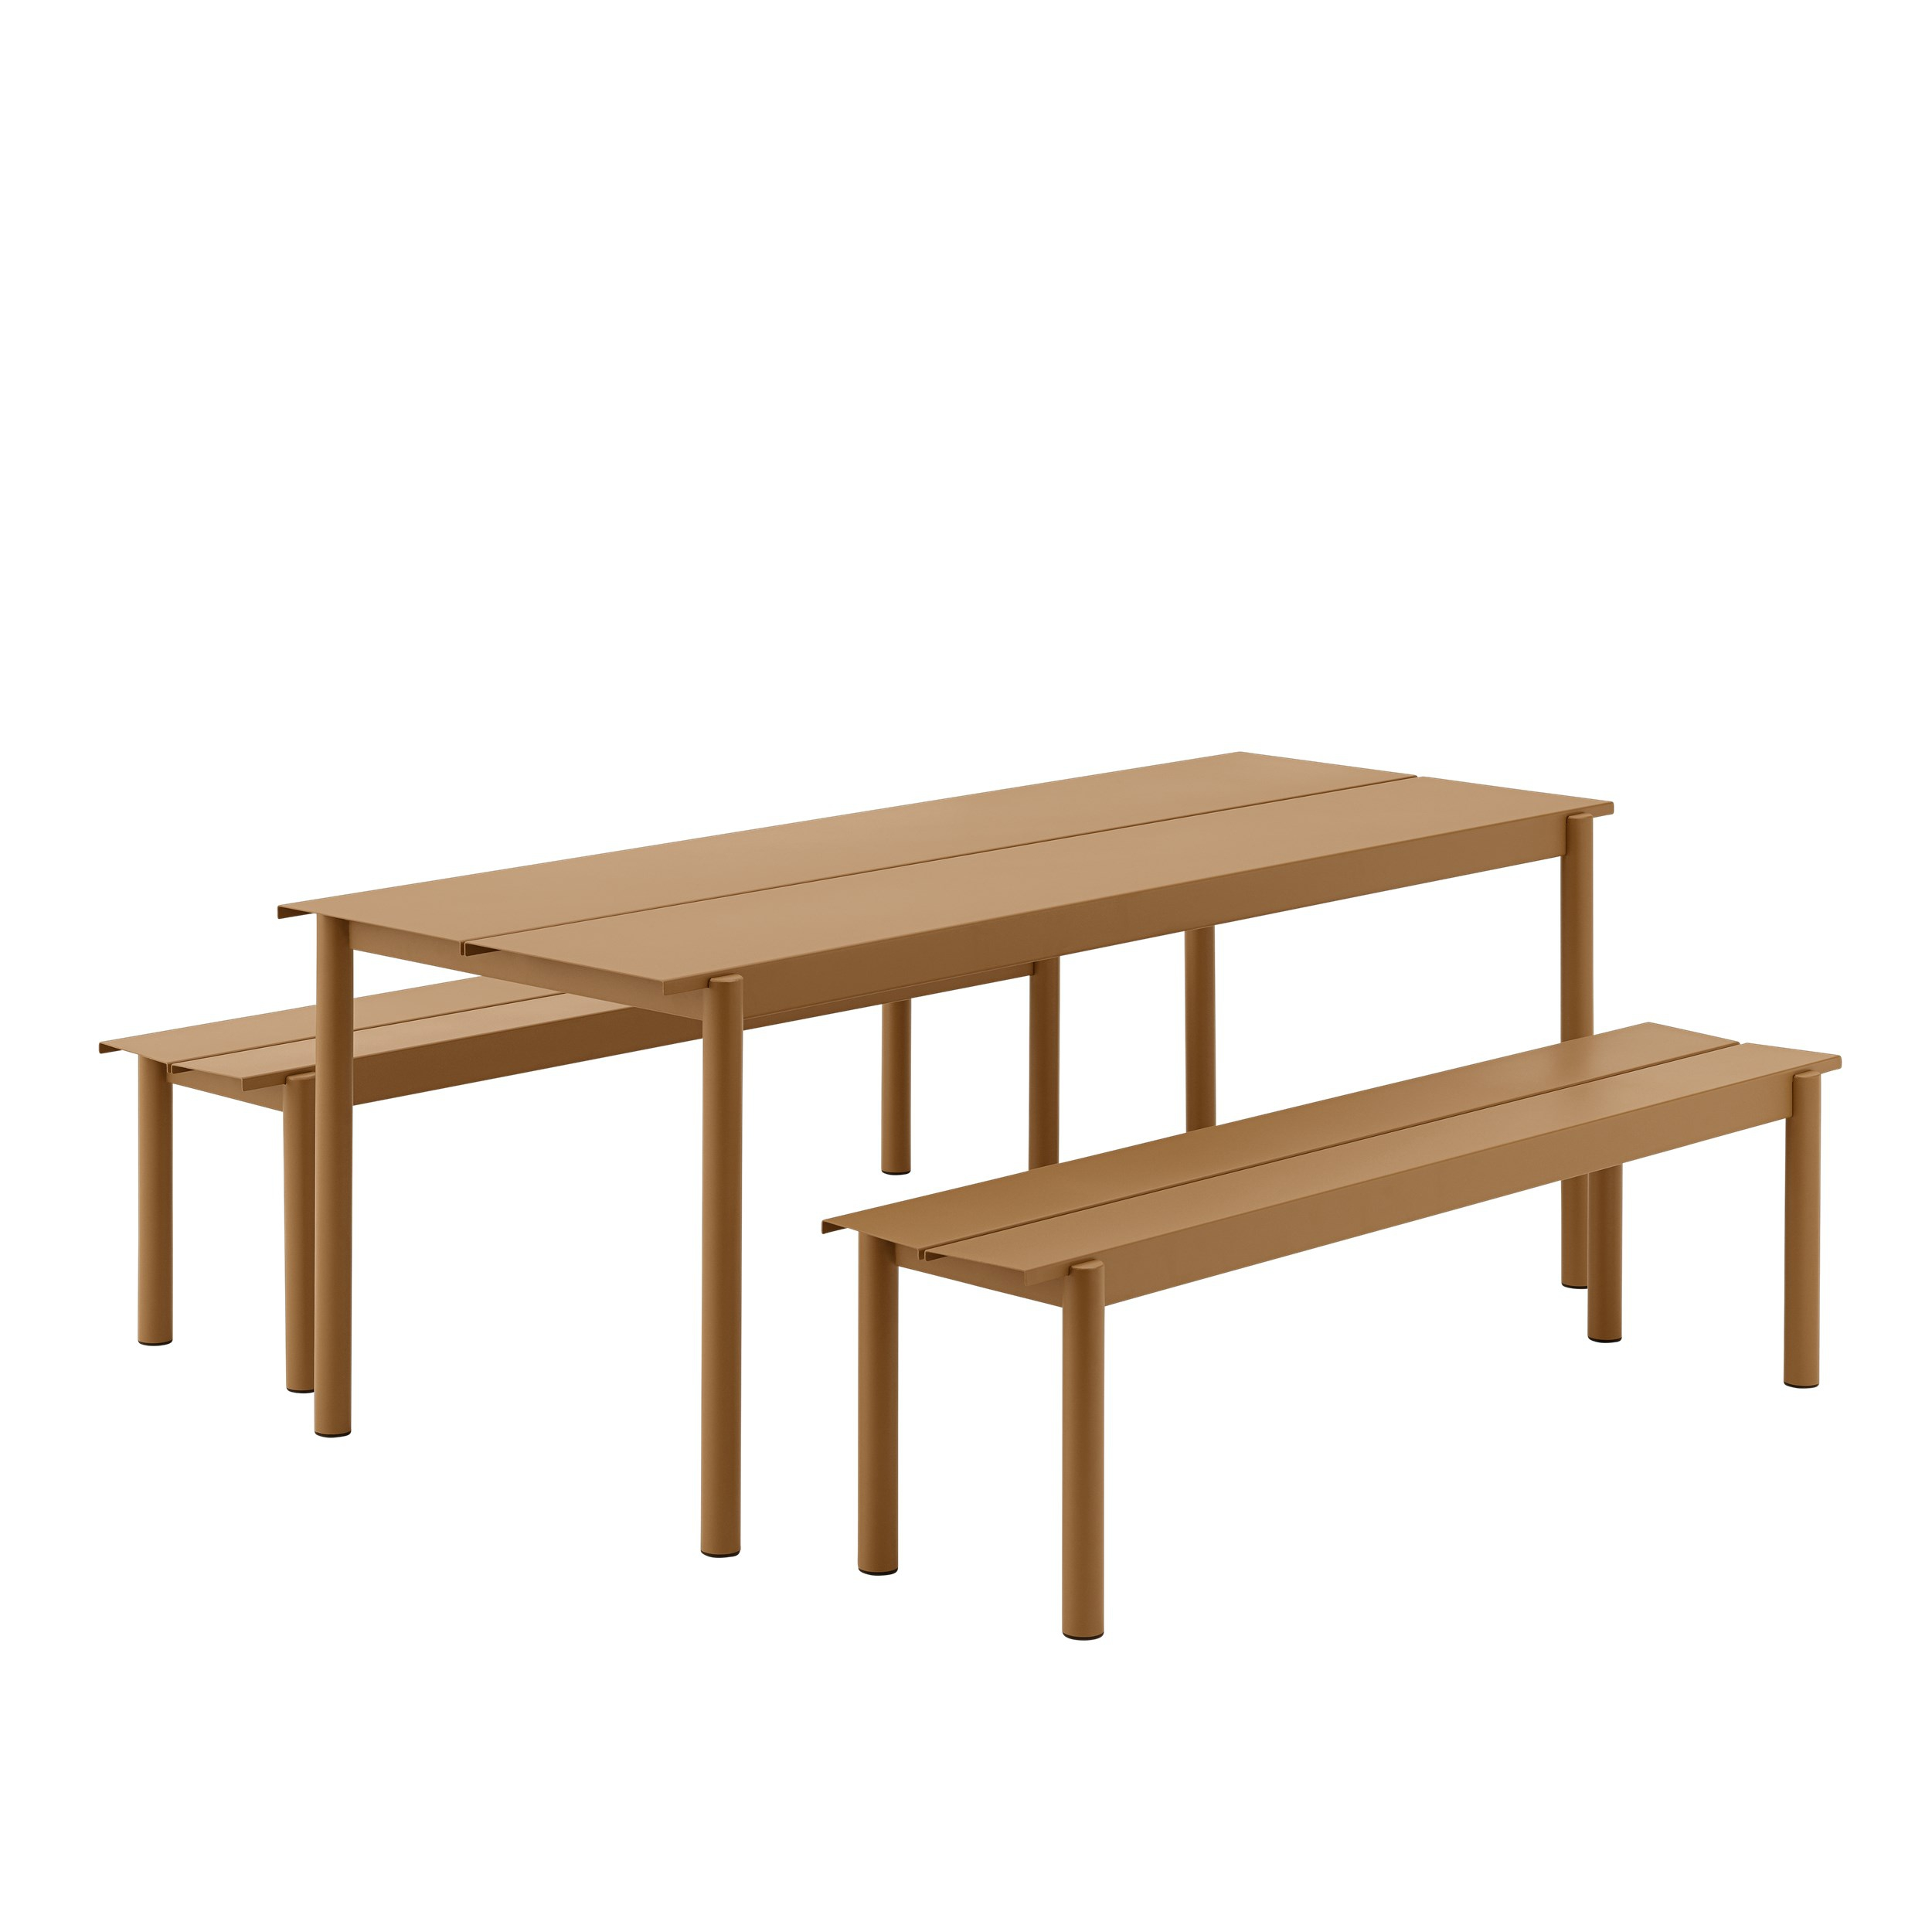 Muuto Linear Table burnt orange 200x75cm